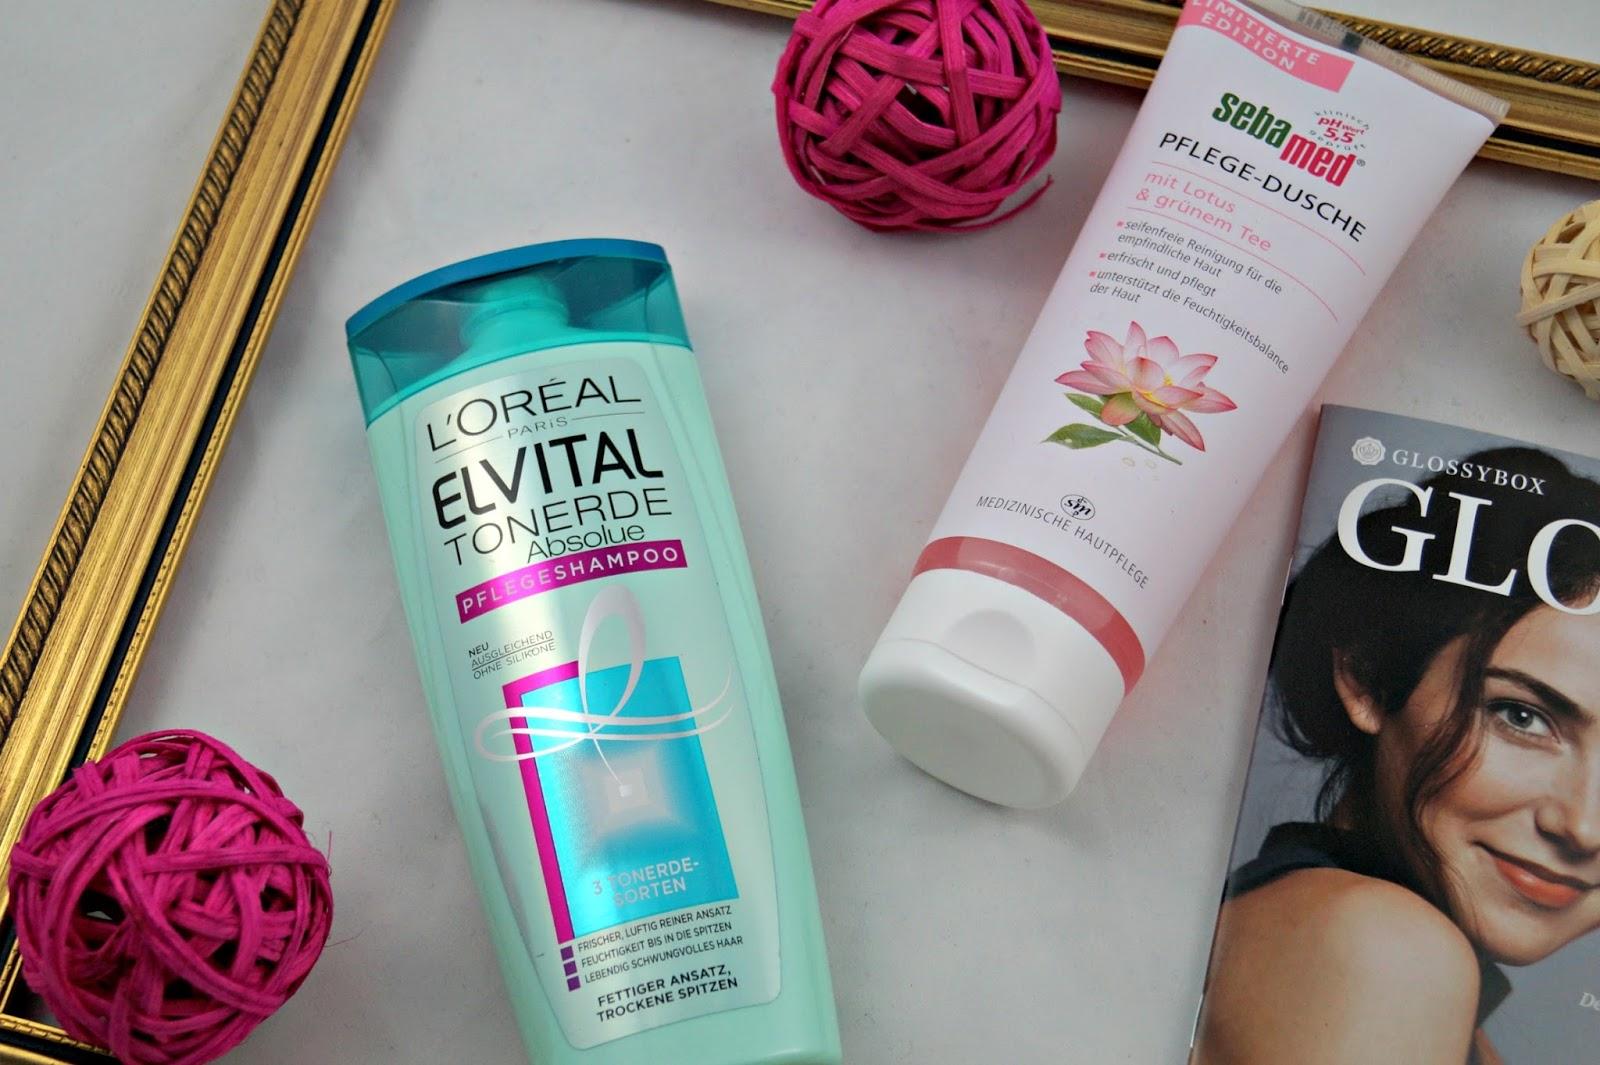 Elvital Tonerde Absolue Shampoo von L'Oréal & sebamed Pflege-Dusche